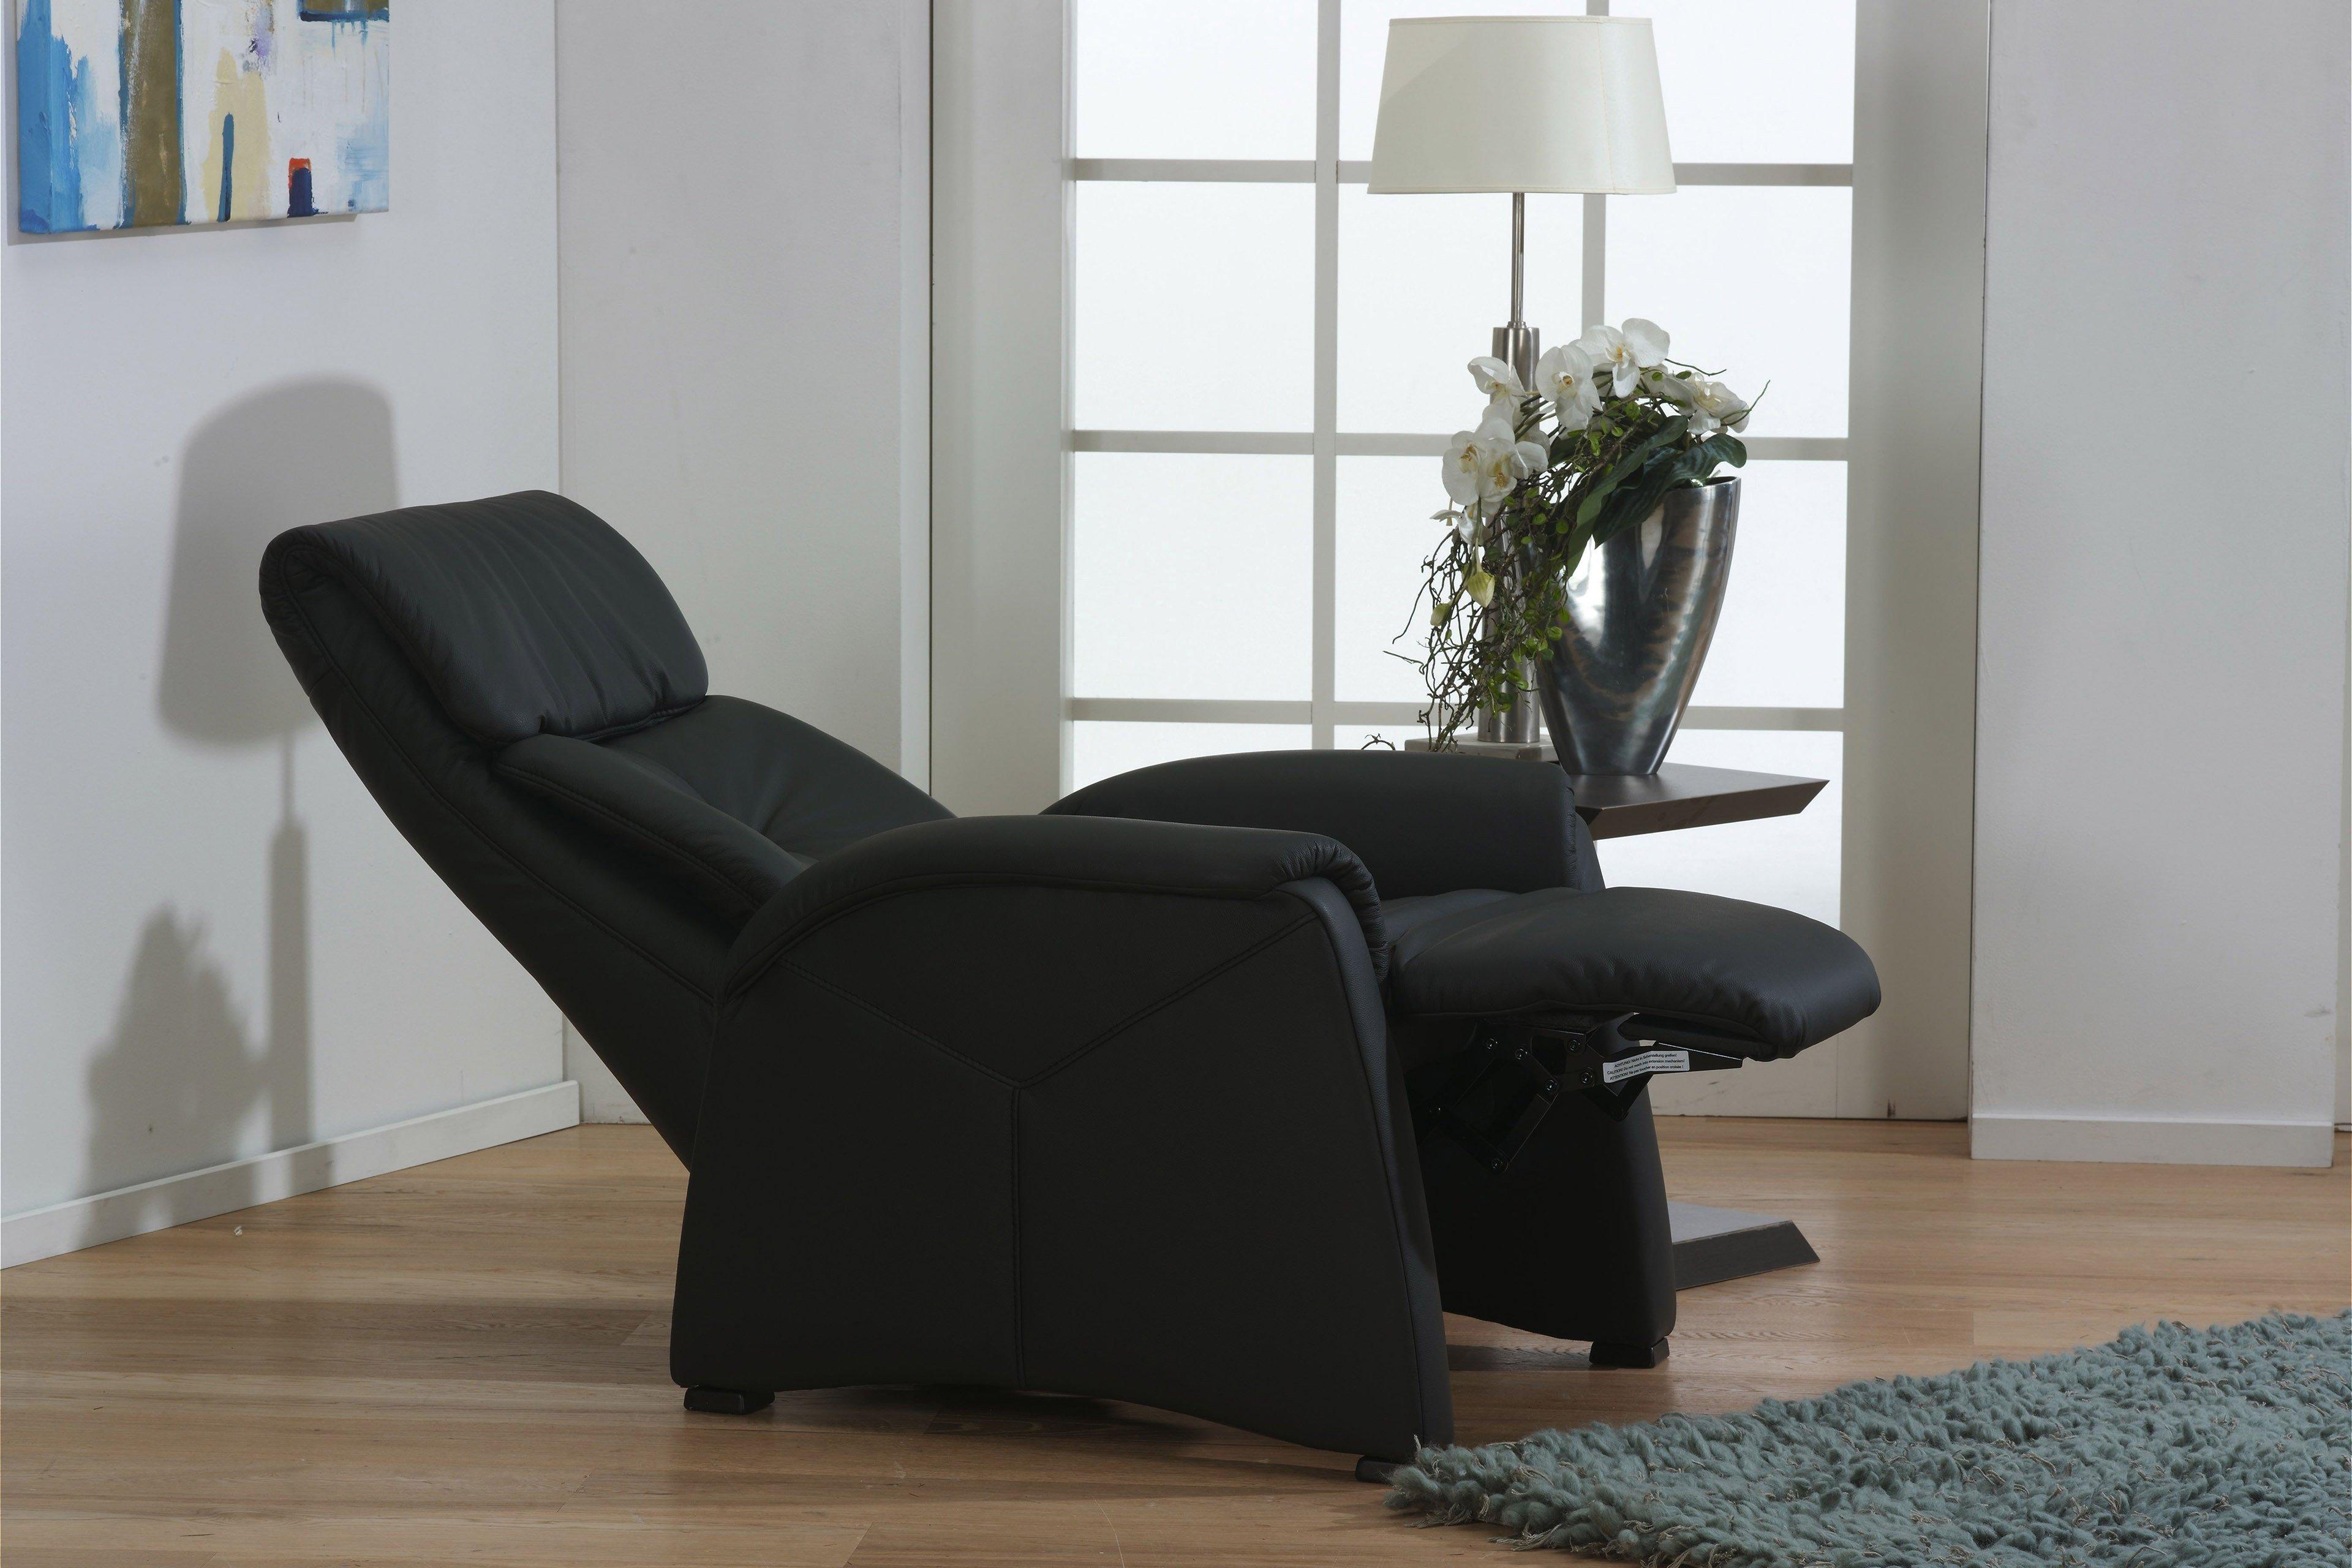 Himolla 7978 Funktionssessel Anthrazit Möbel Letz Ihr Online Shop